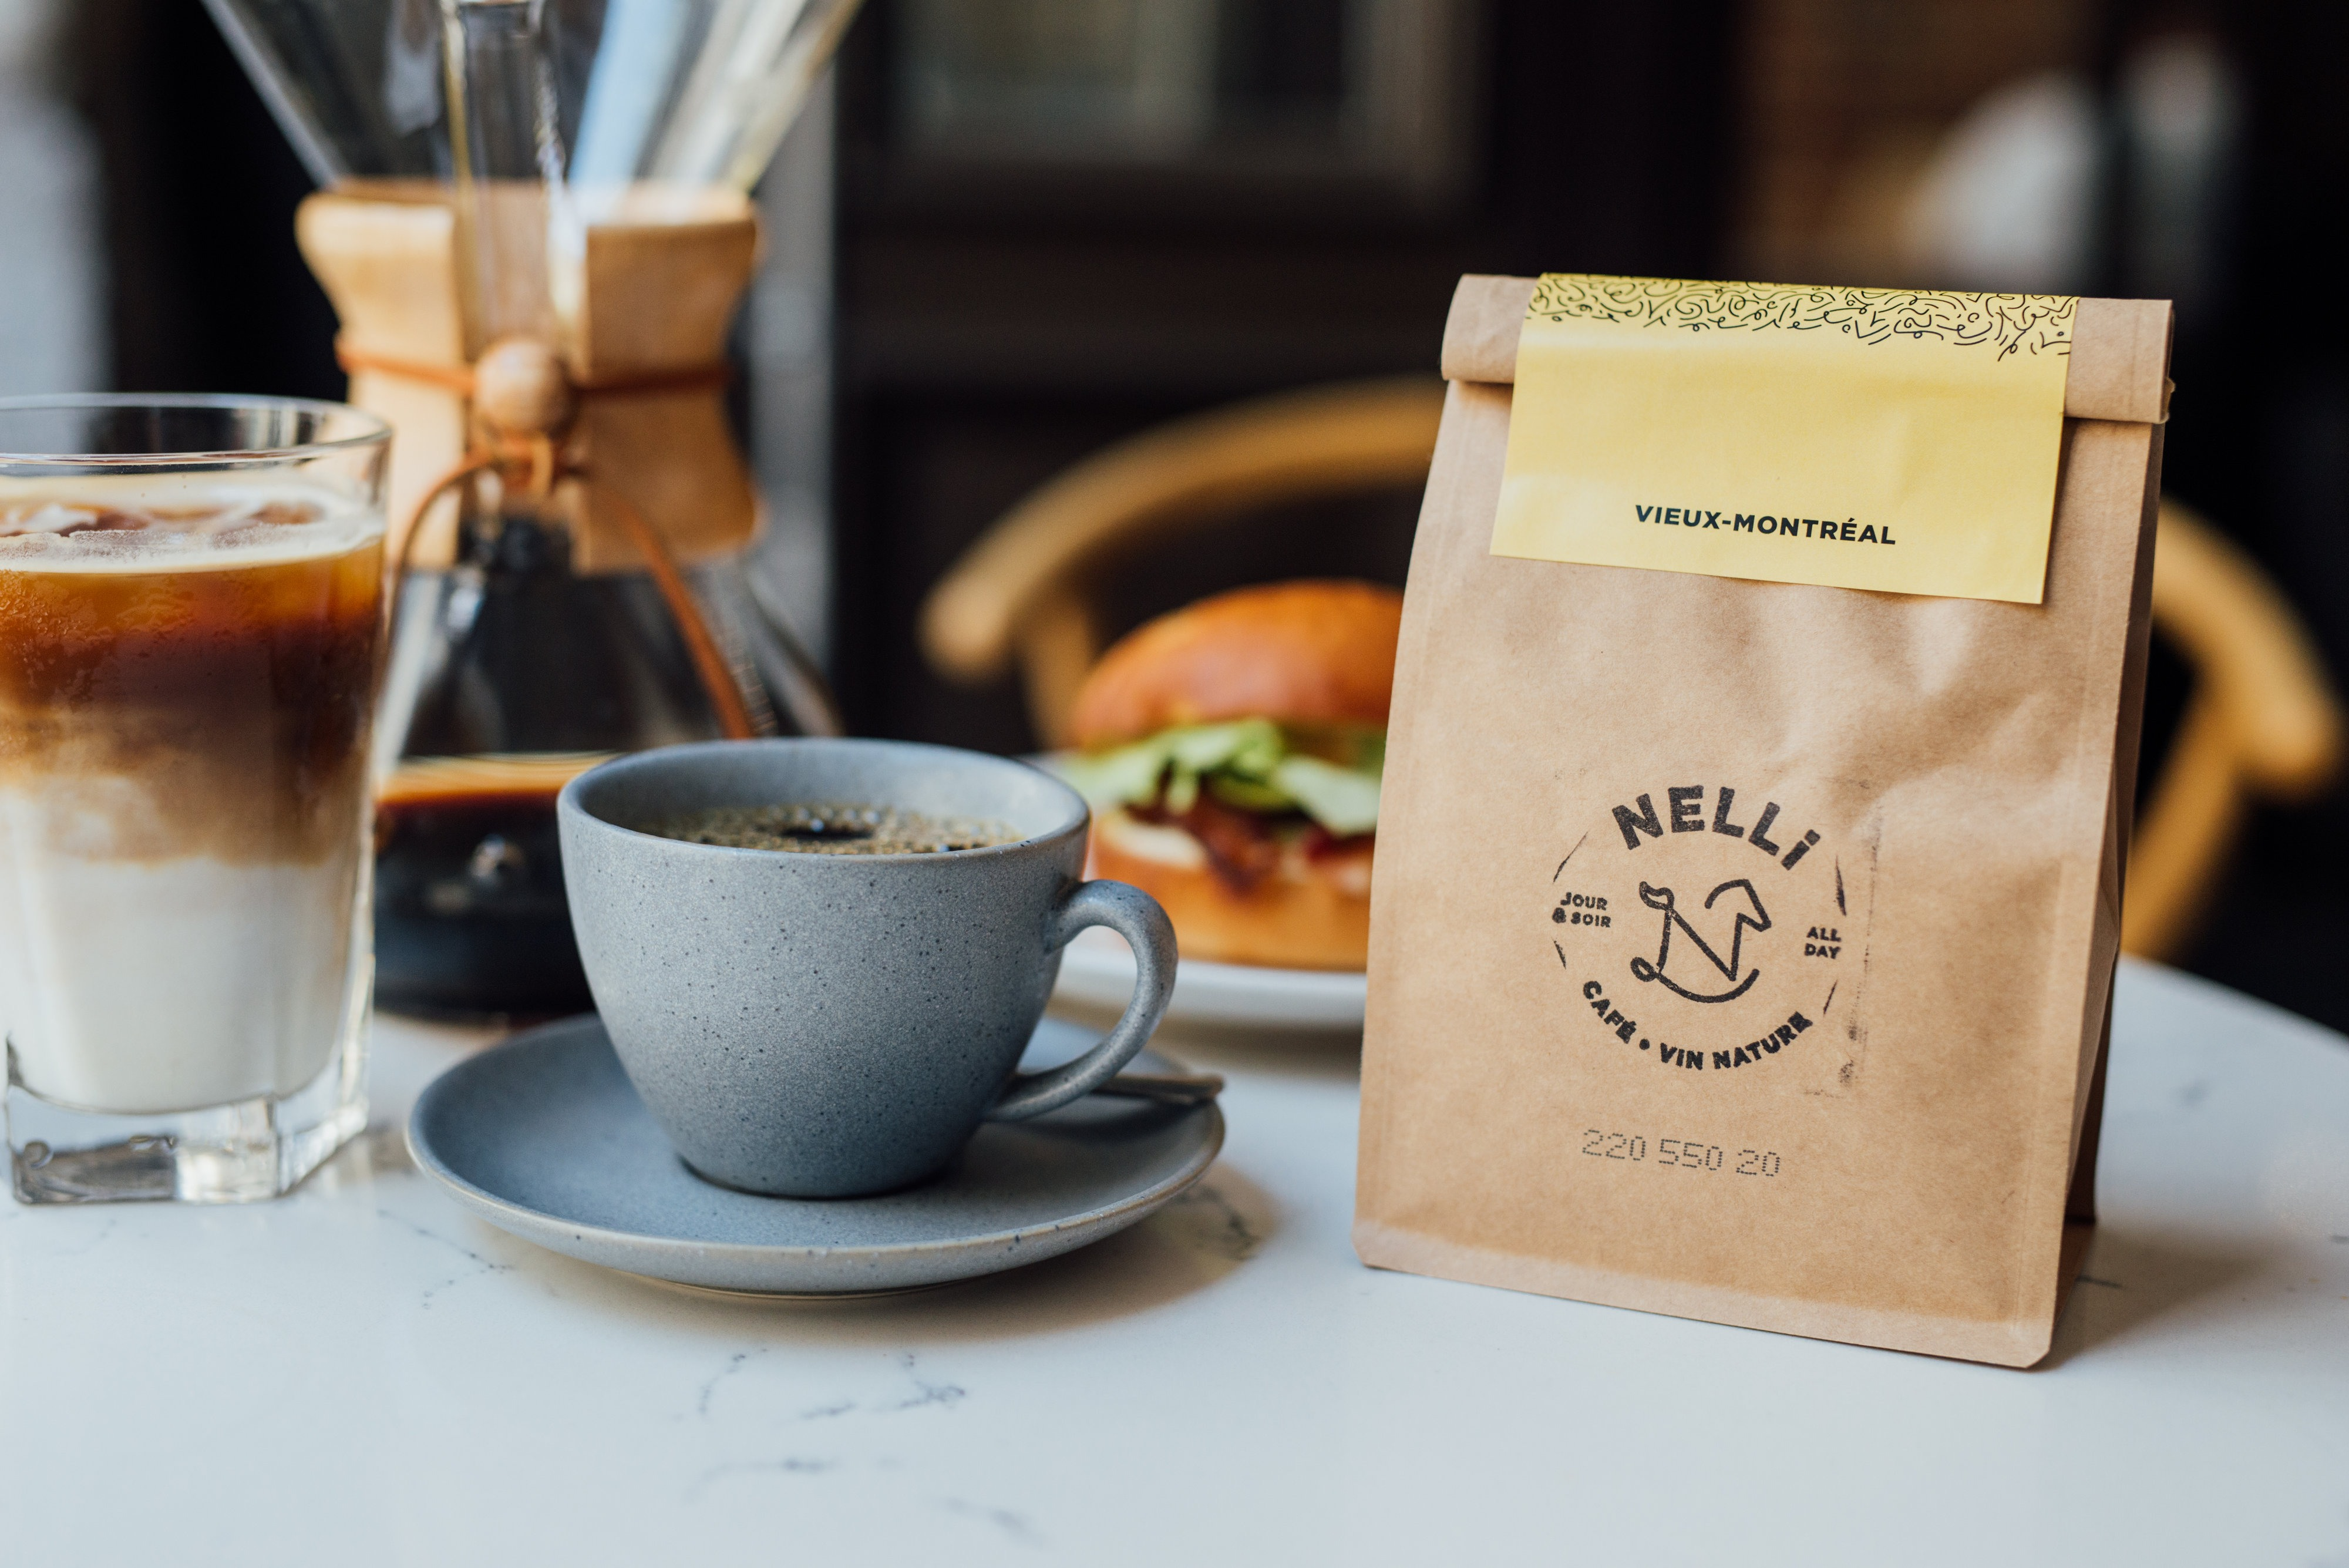 Café Nelli + Vin nature